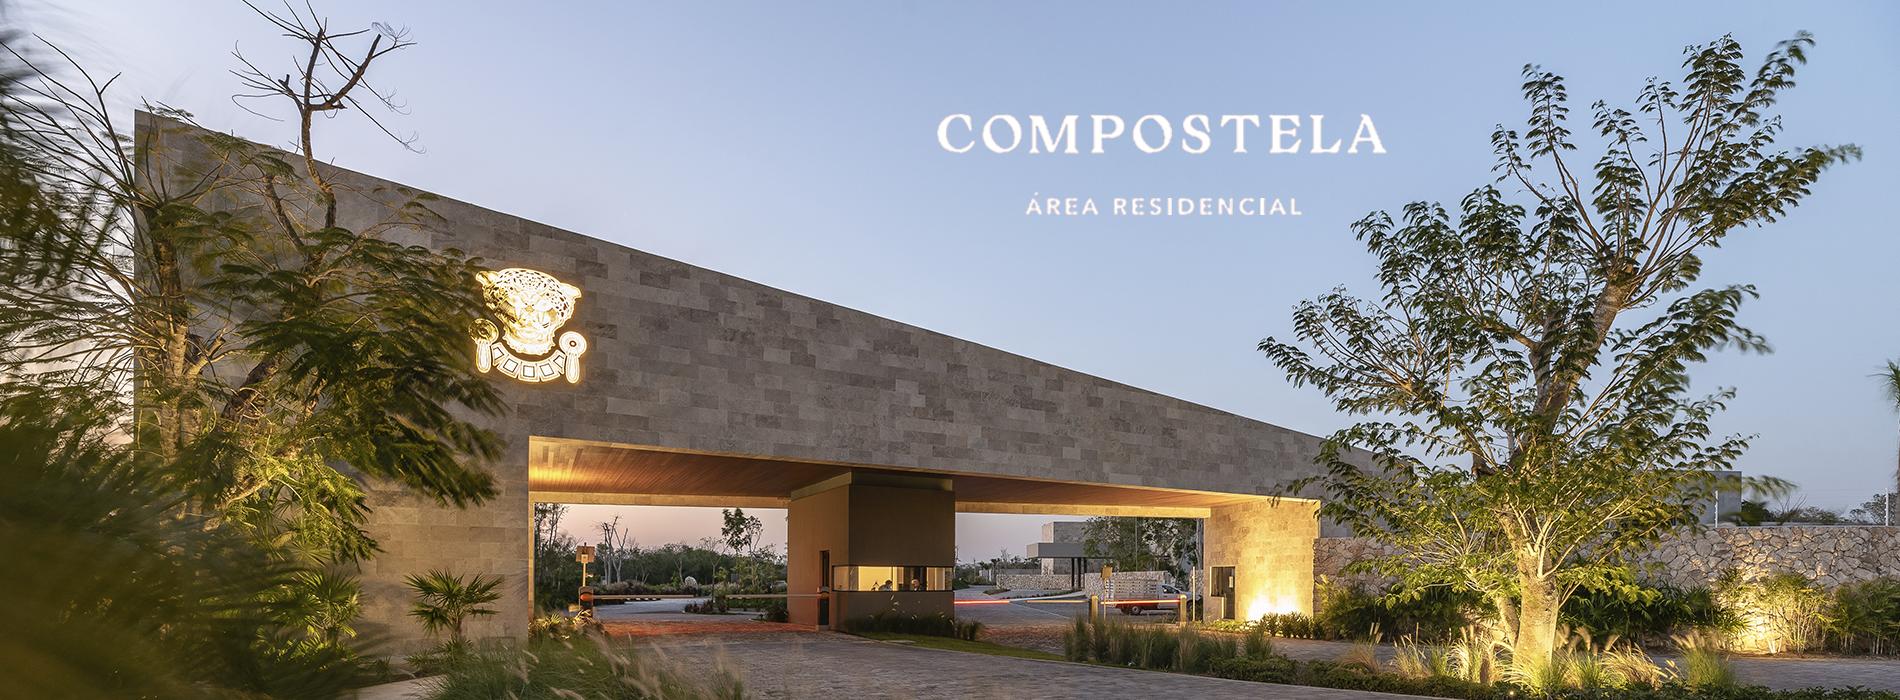 Terrenos Residenciales Venta Mérida Compostela Goodlers